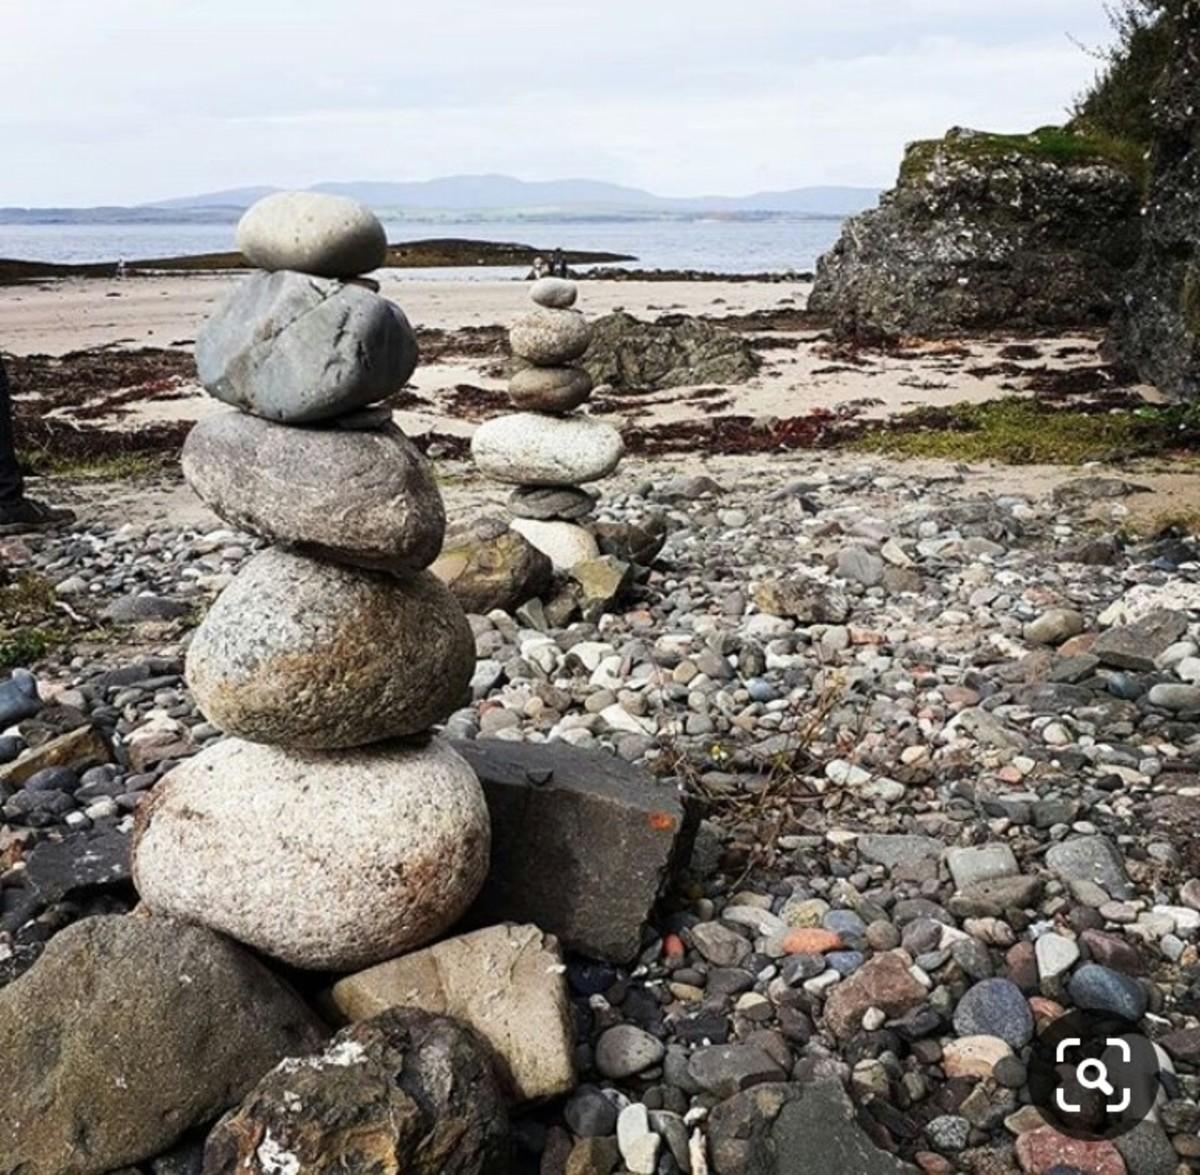 A Balancing Stones